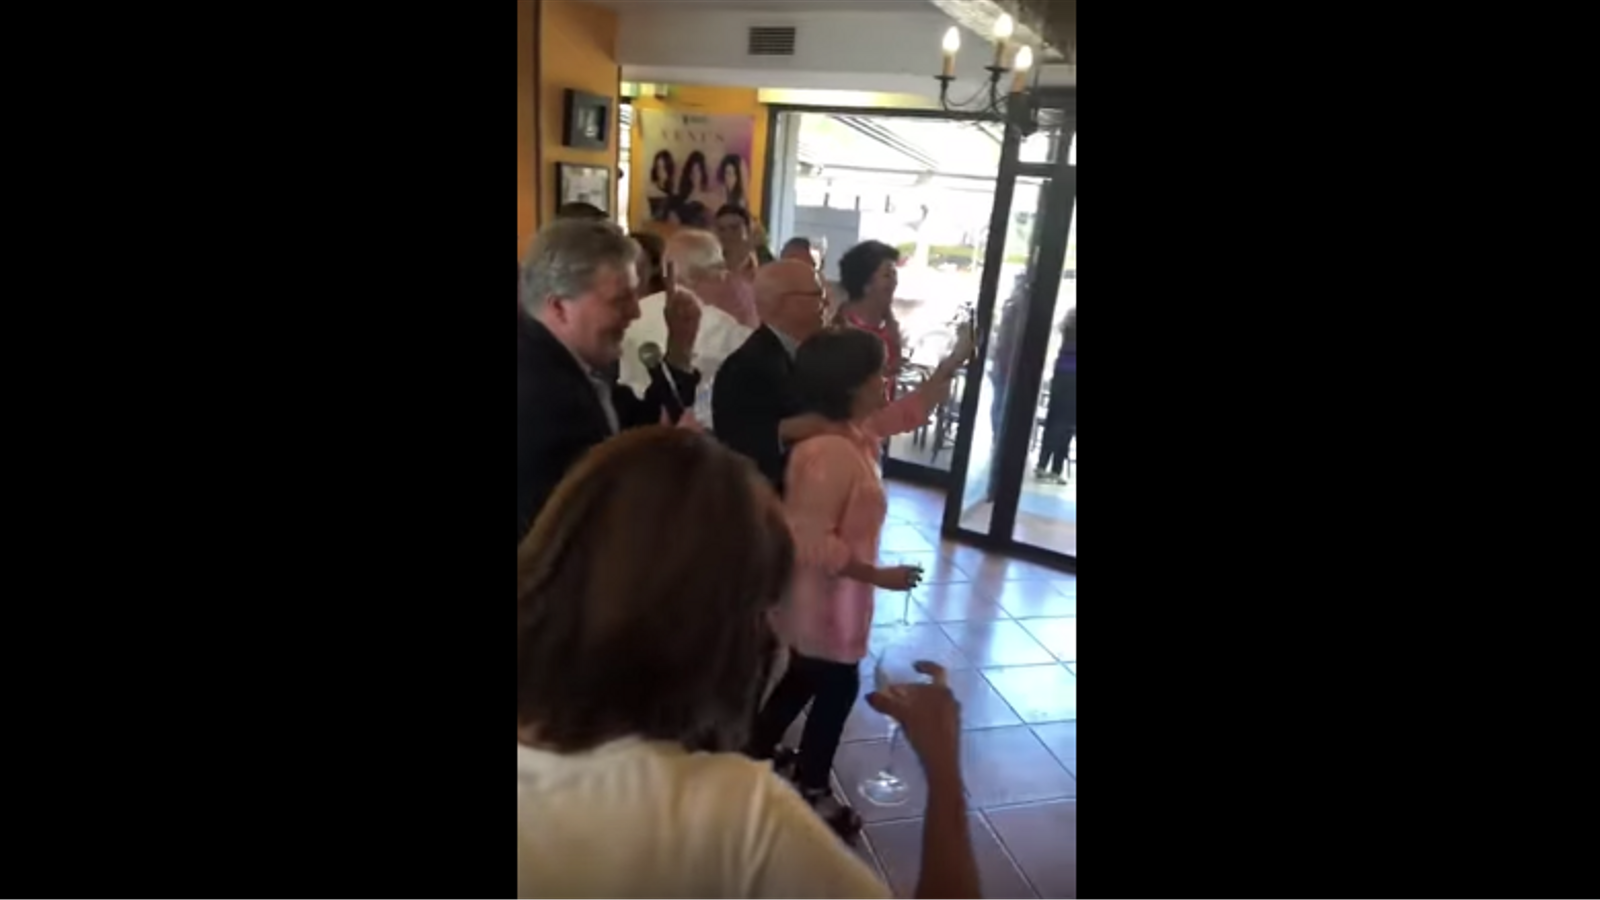 Soraya Sáenz de Santamaría i Méndez de Vigo revolucionen la xarxa amb un vídeo d'un karaoke